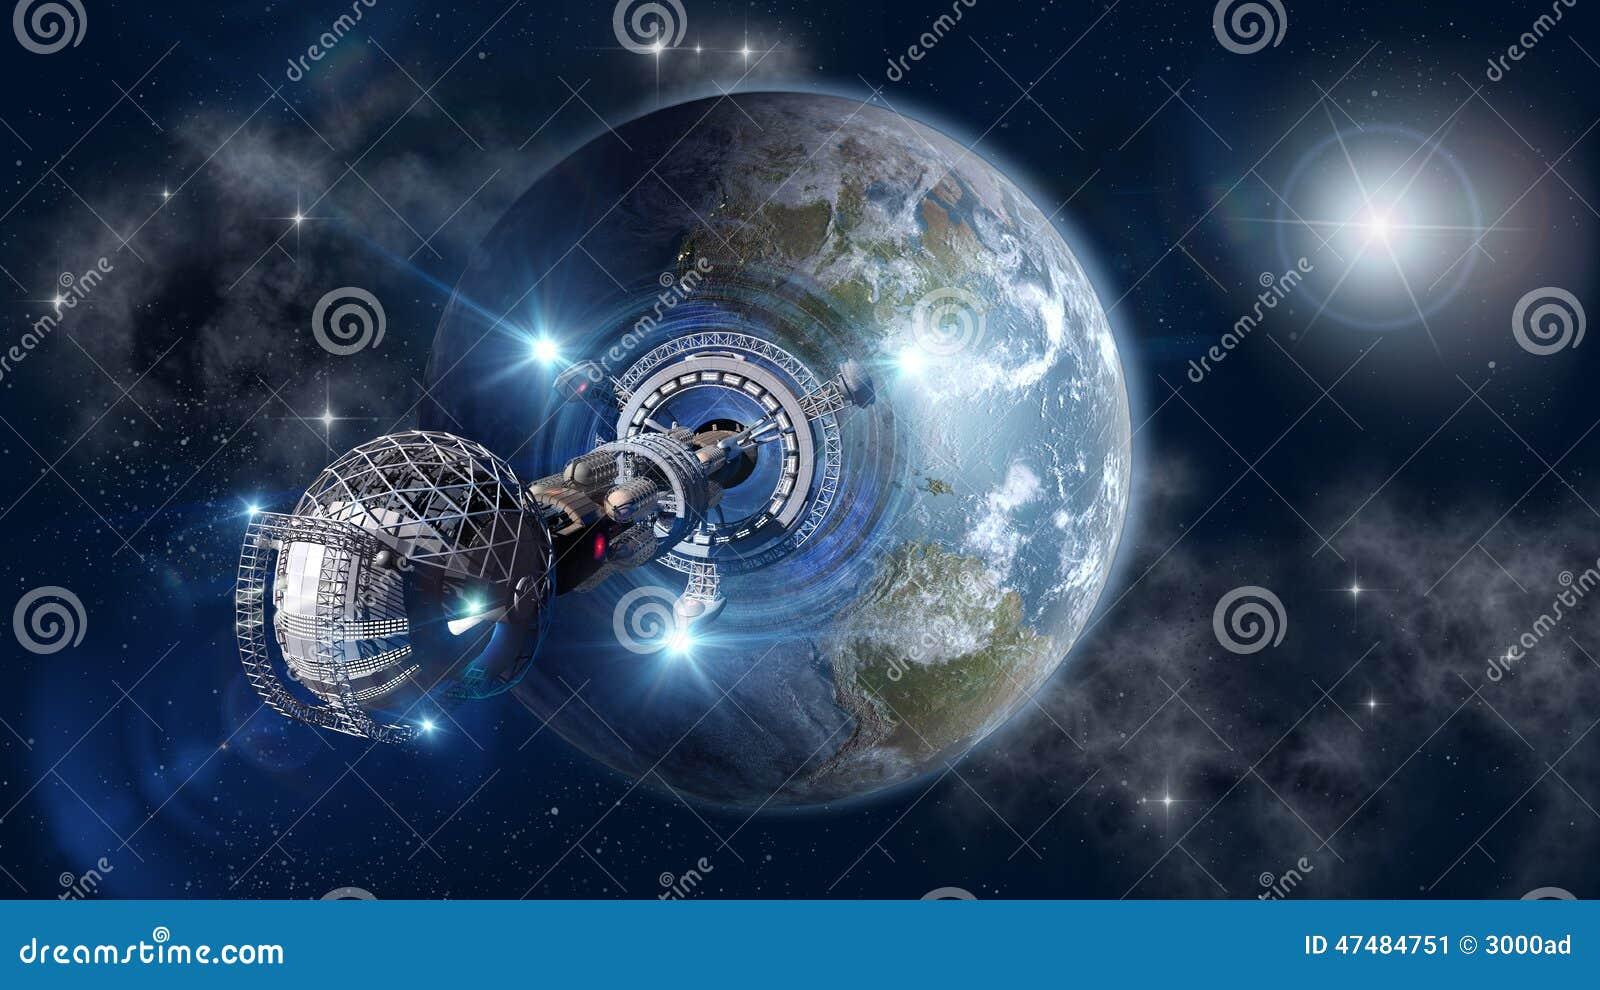 Futuristic travel exploring the universe